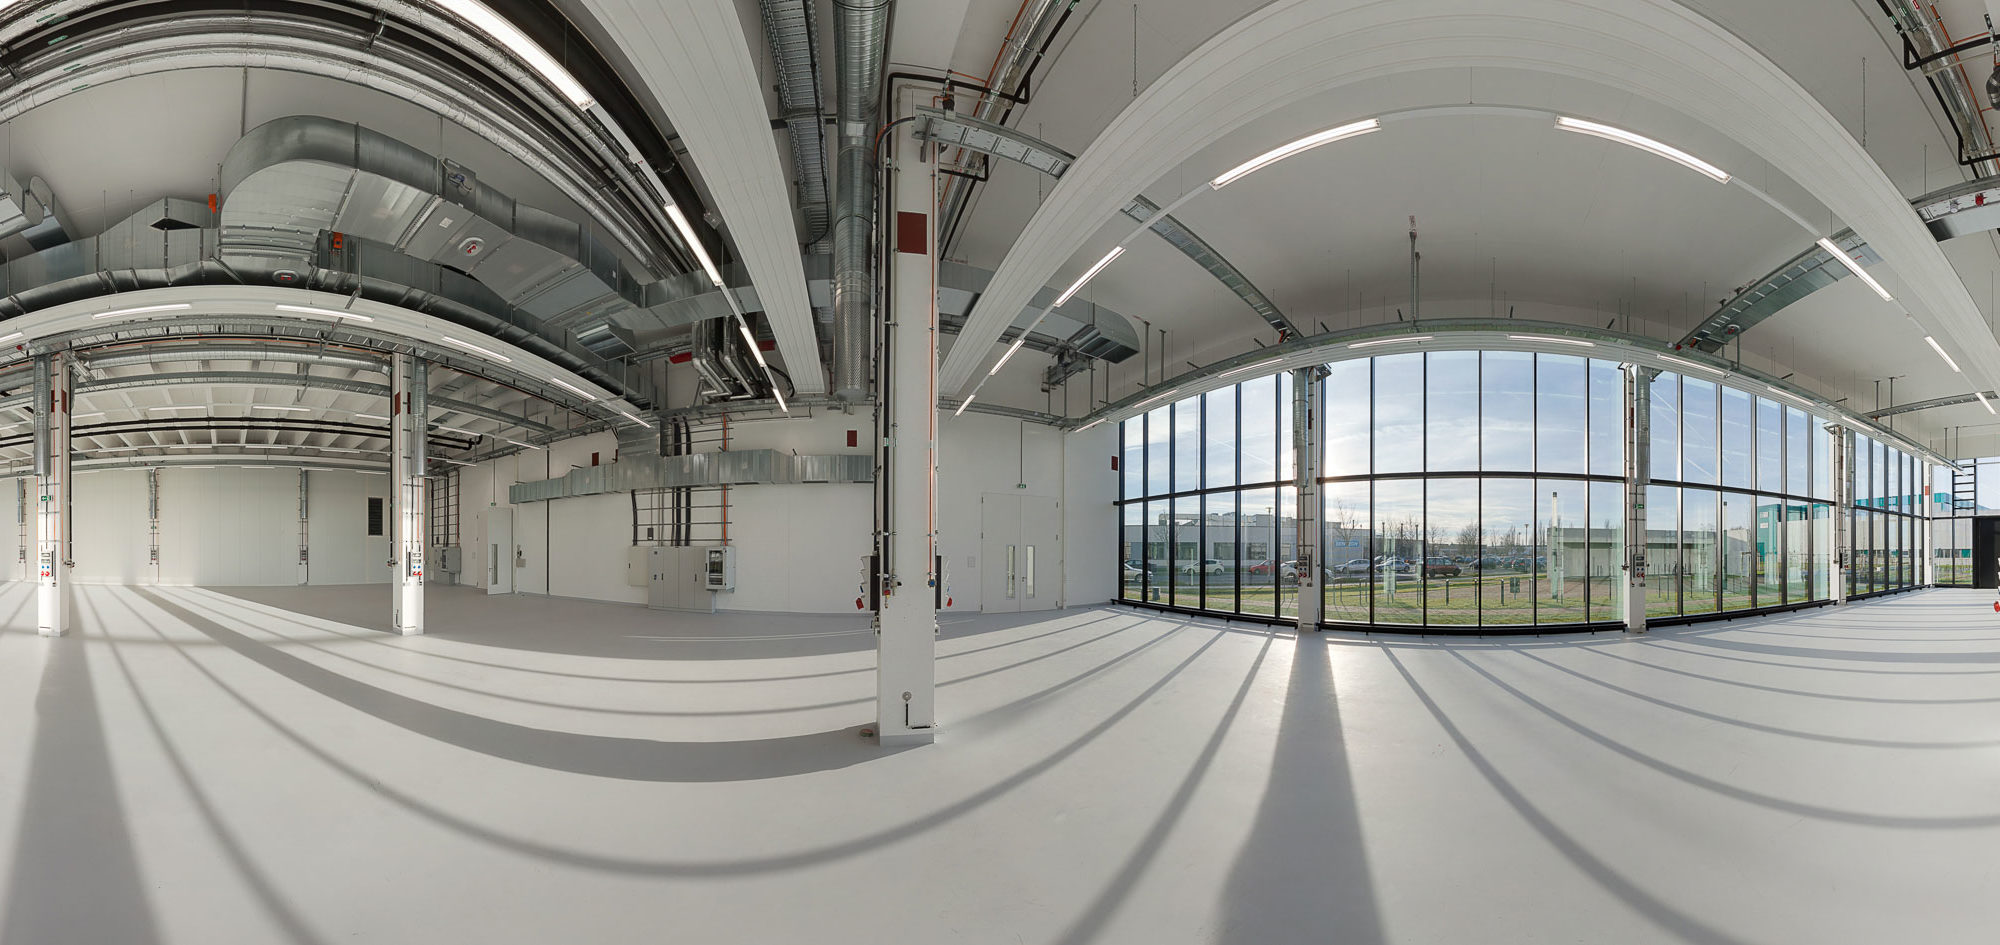 _mg_8779-panorama-merc-bearbeitet